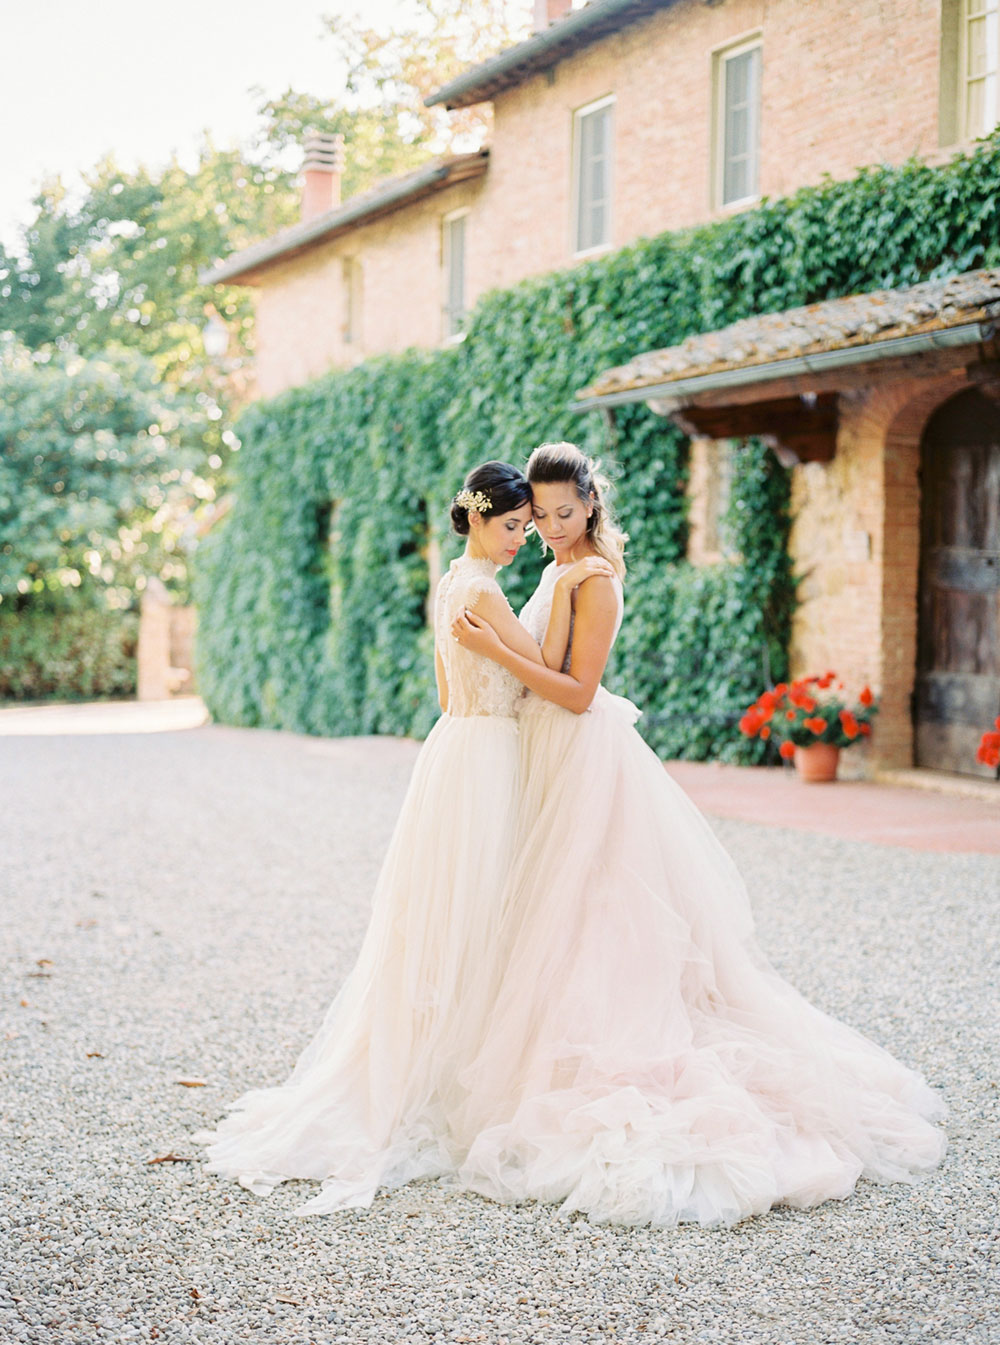 Linari-Tuscany-Elopement-Courtney-Michaela-158